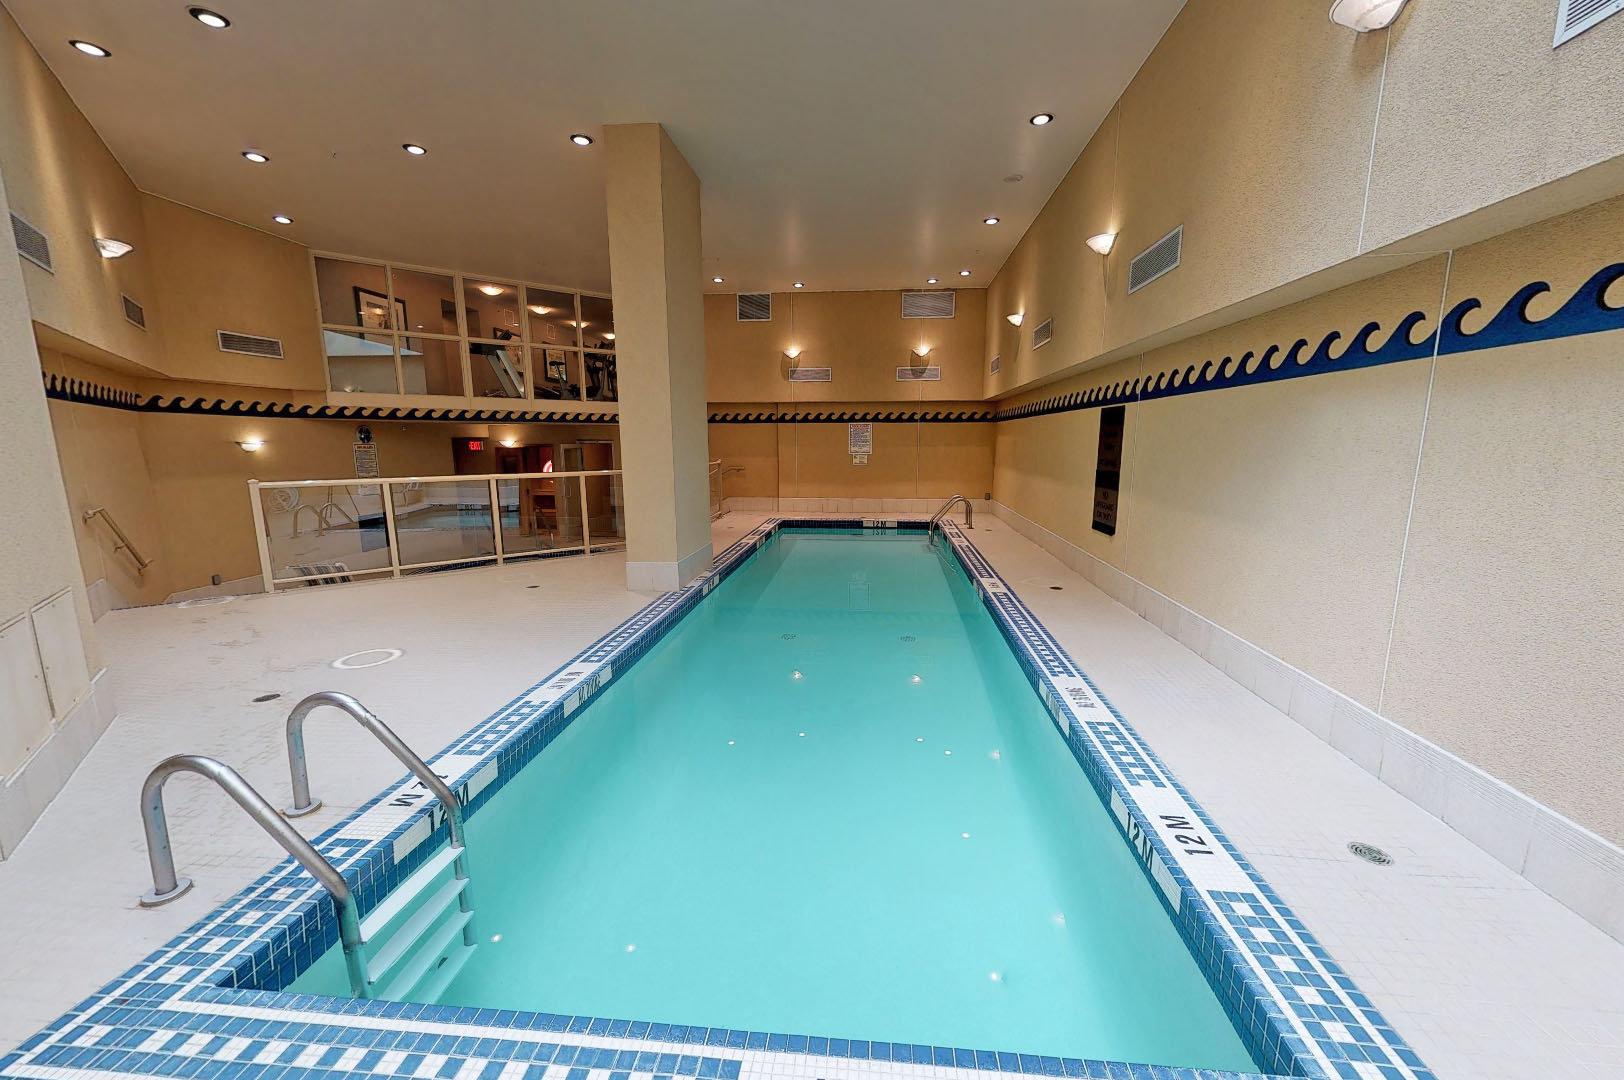 Crestmark II at 1228 Marinaside Crescent -  Pool!